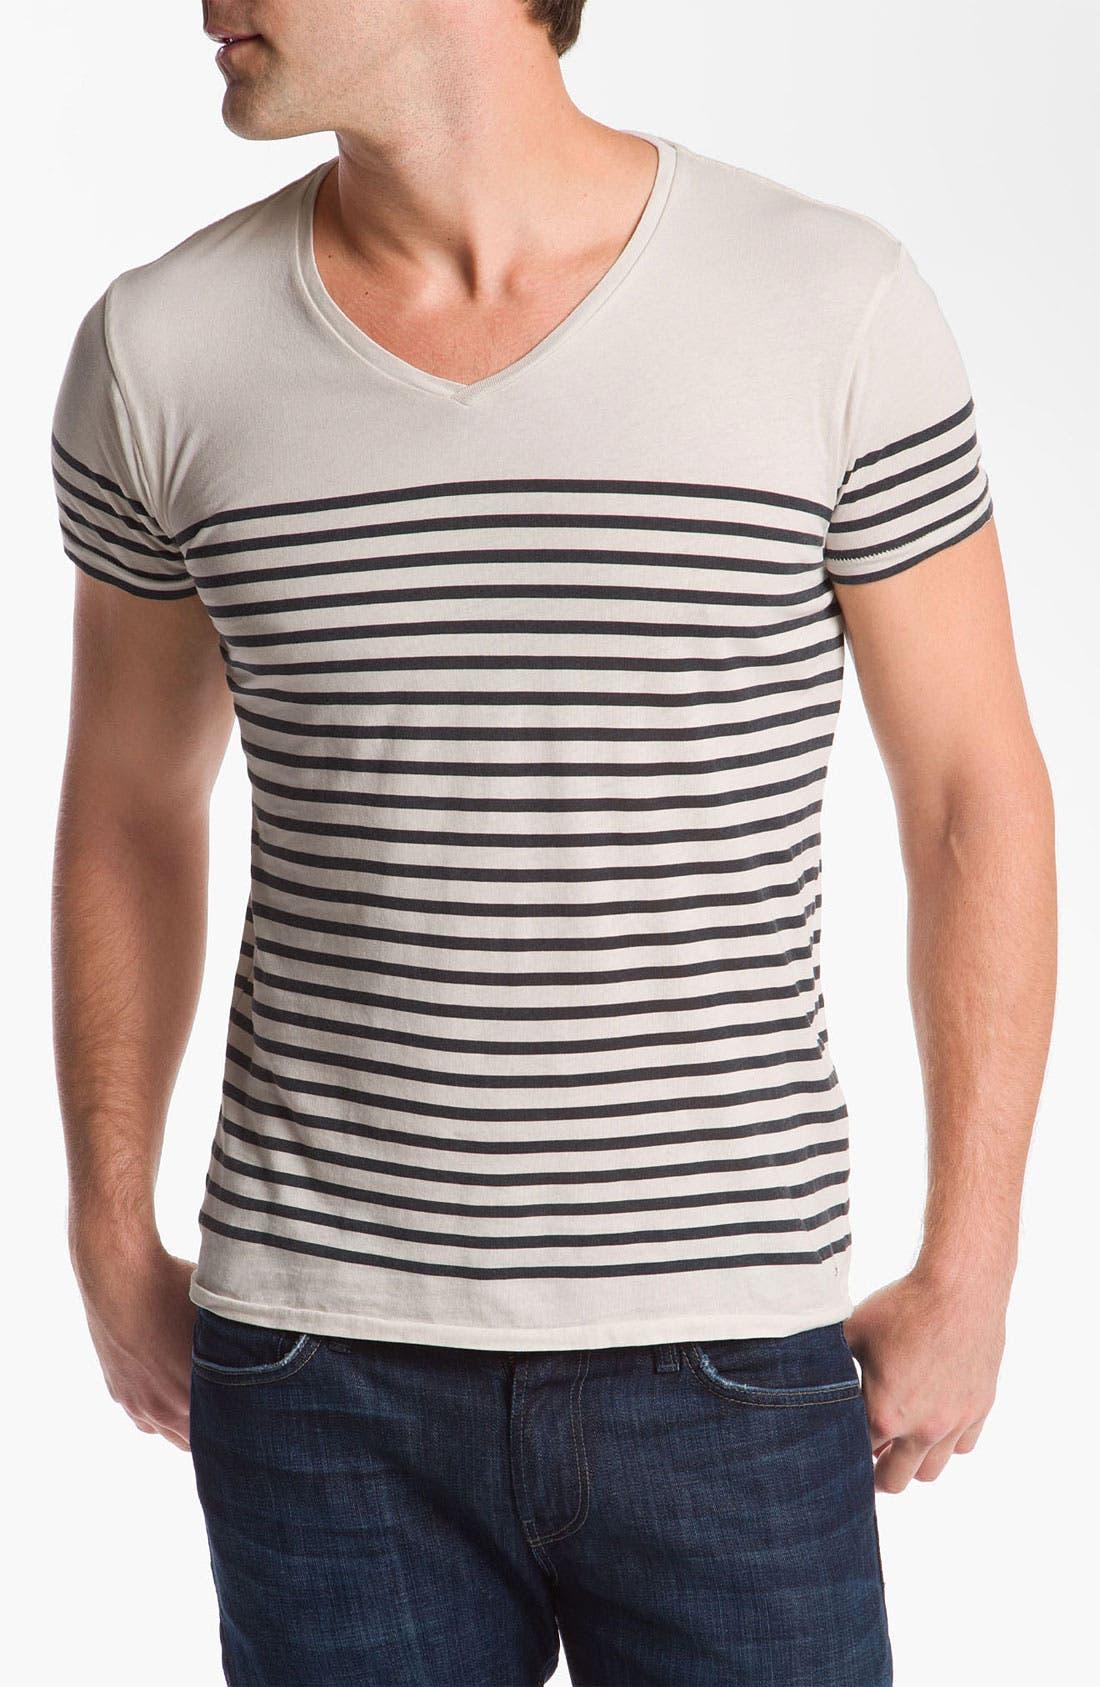 Main Image - Scotch & Soda Oil Washed V-Neck T-Shirt